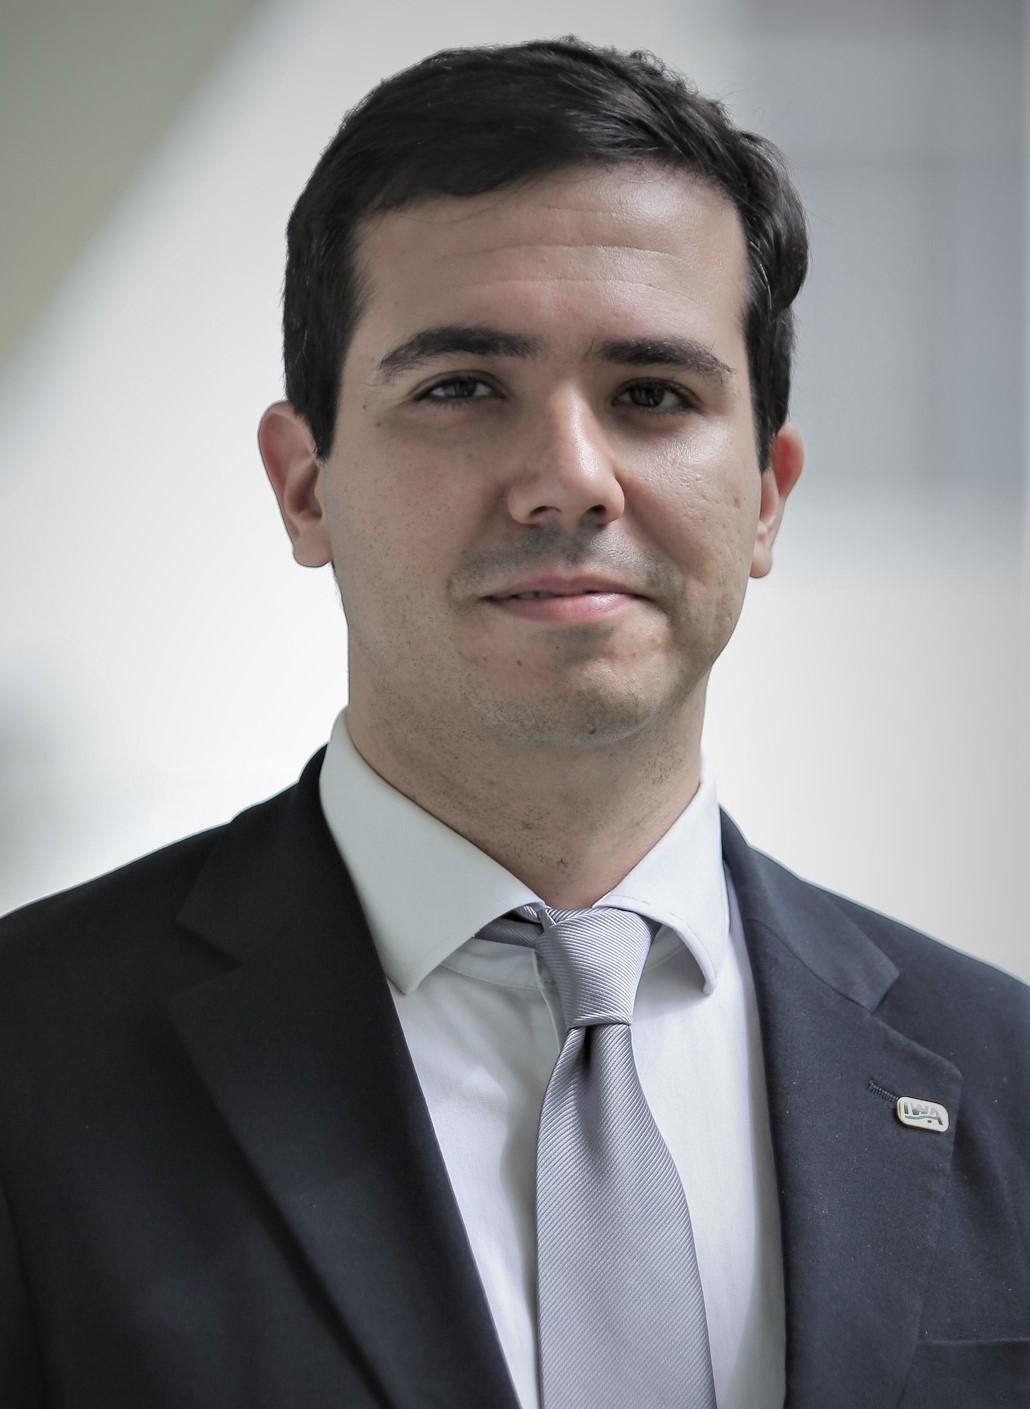 Joao Grilo